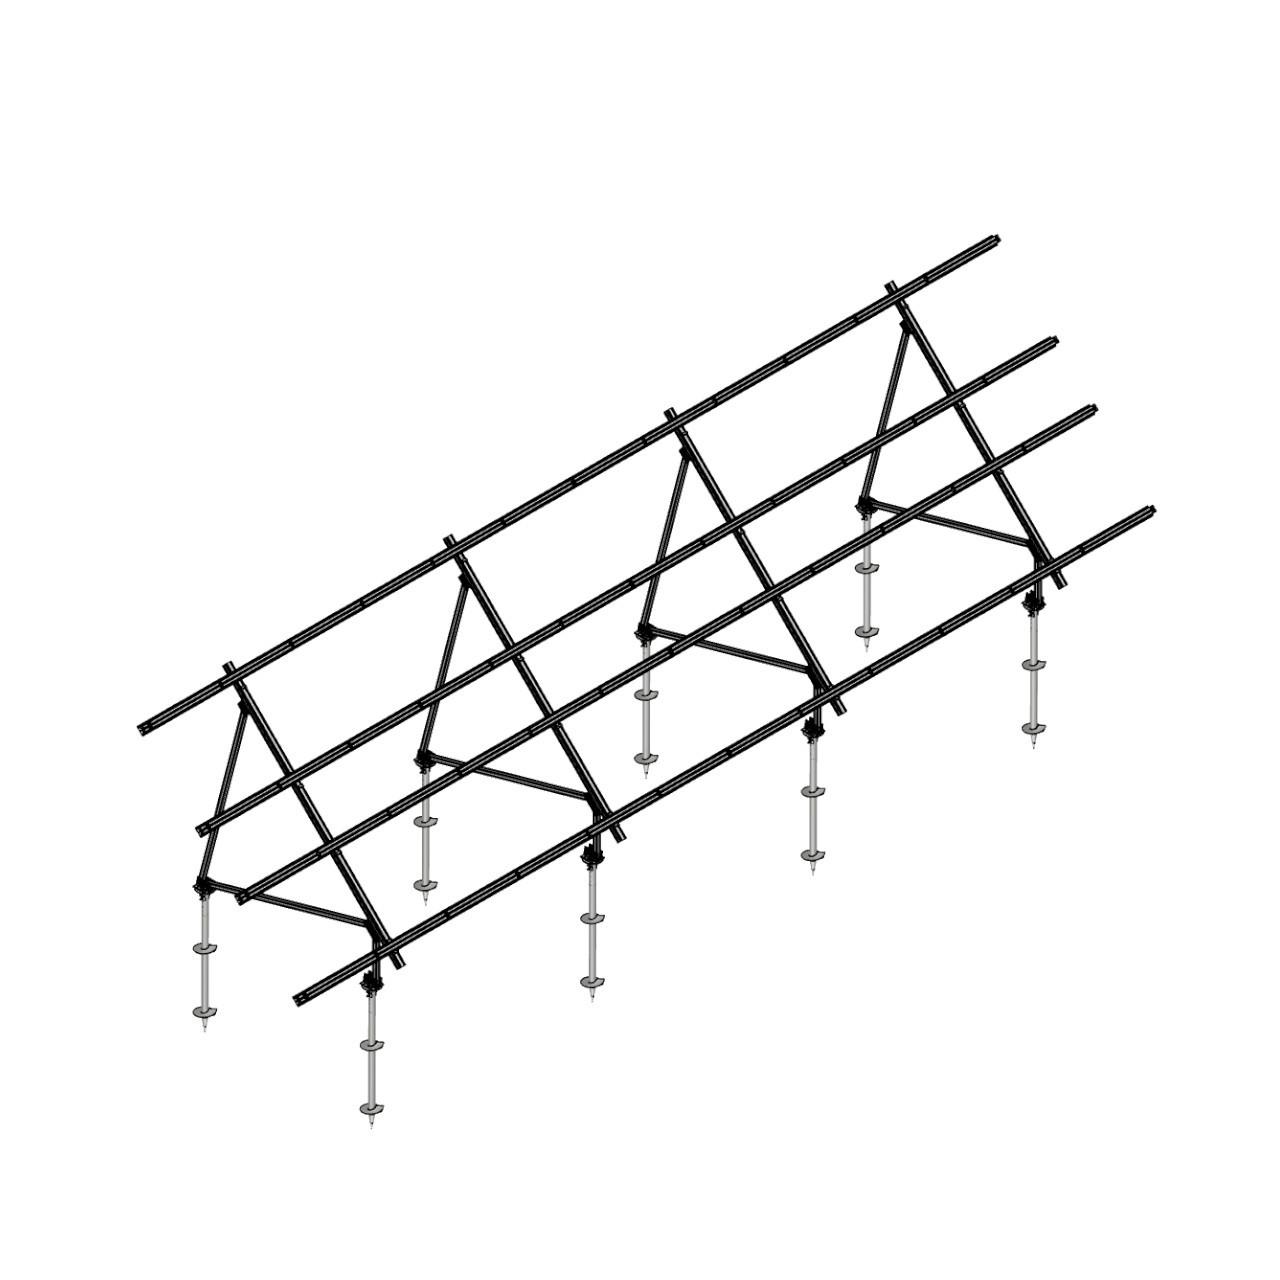 Schletter - PVMax 2Vx12-45deg-Screw-No-Panels